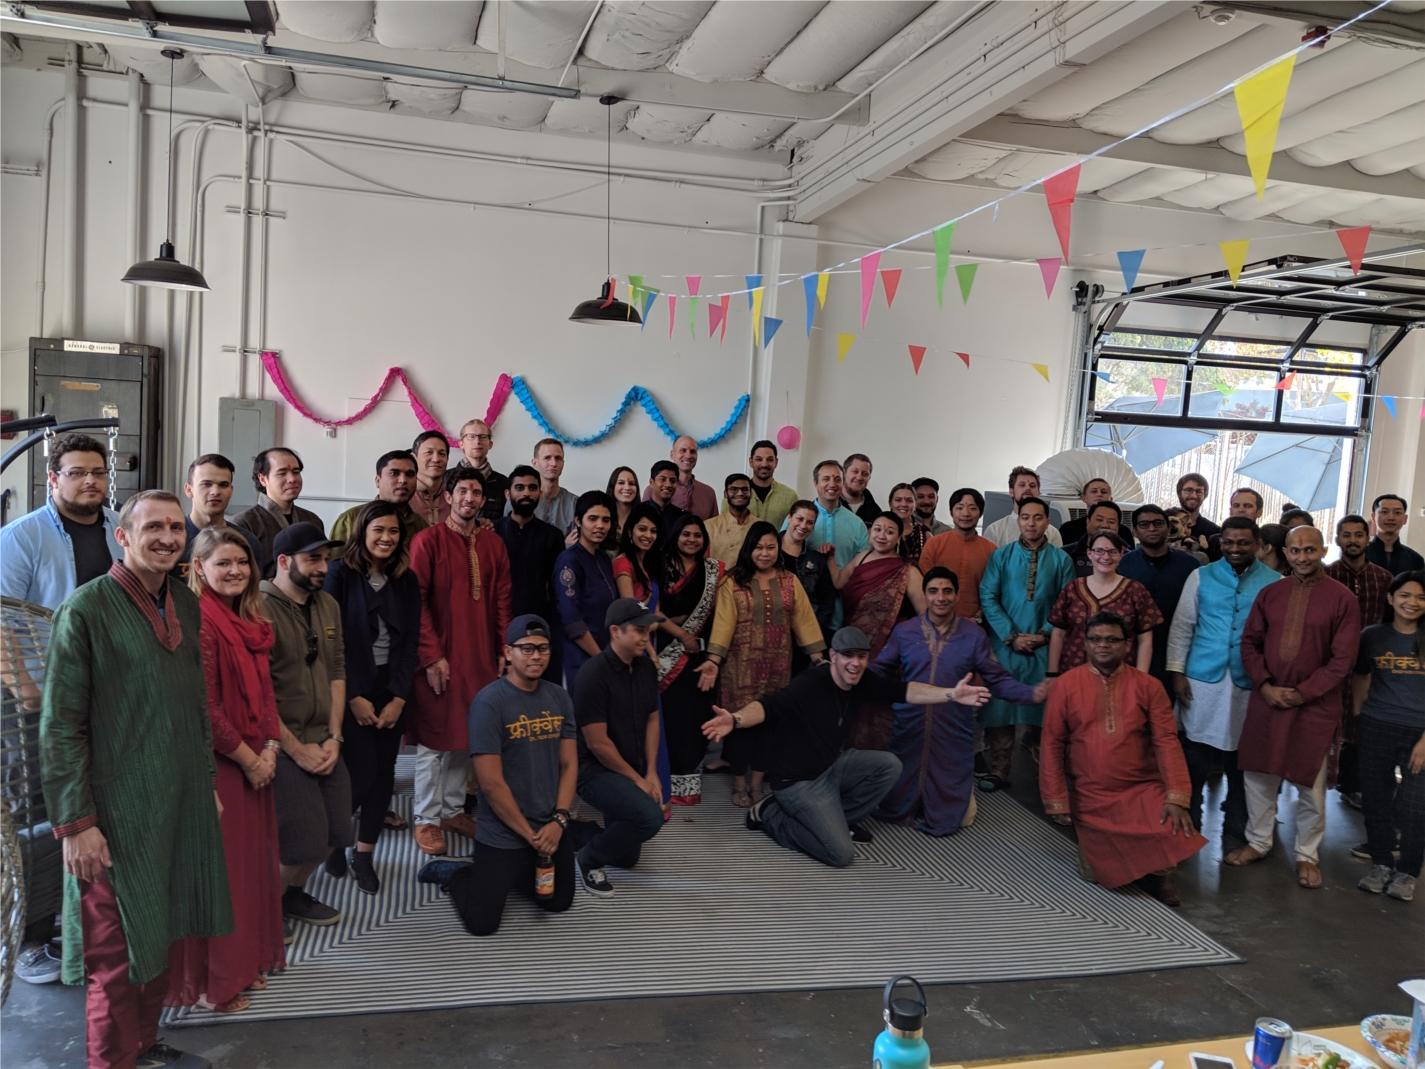 Celebrating Diwali at Frequence